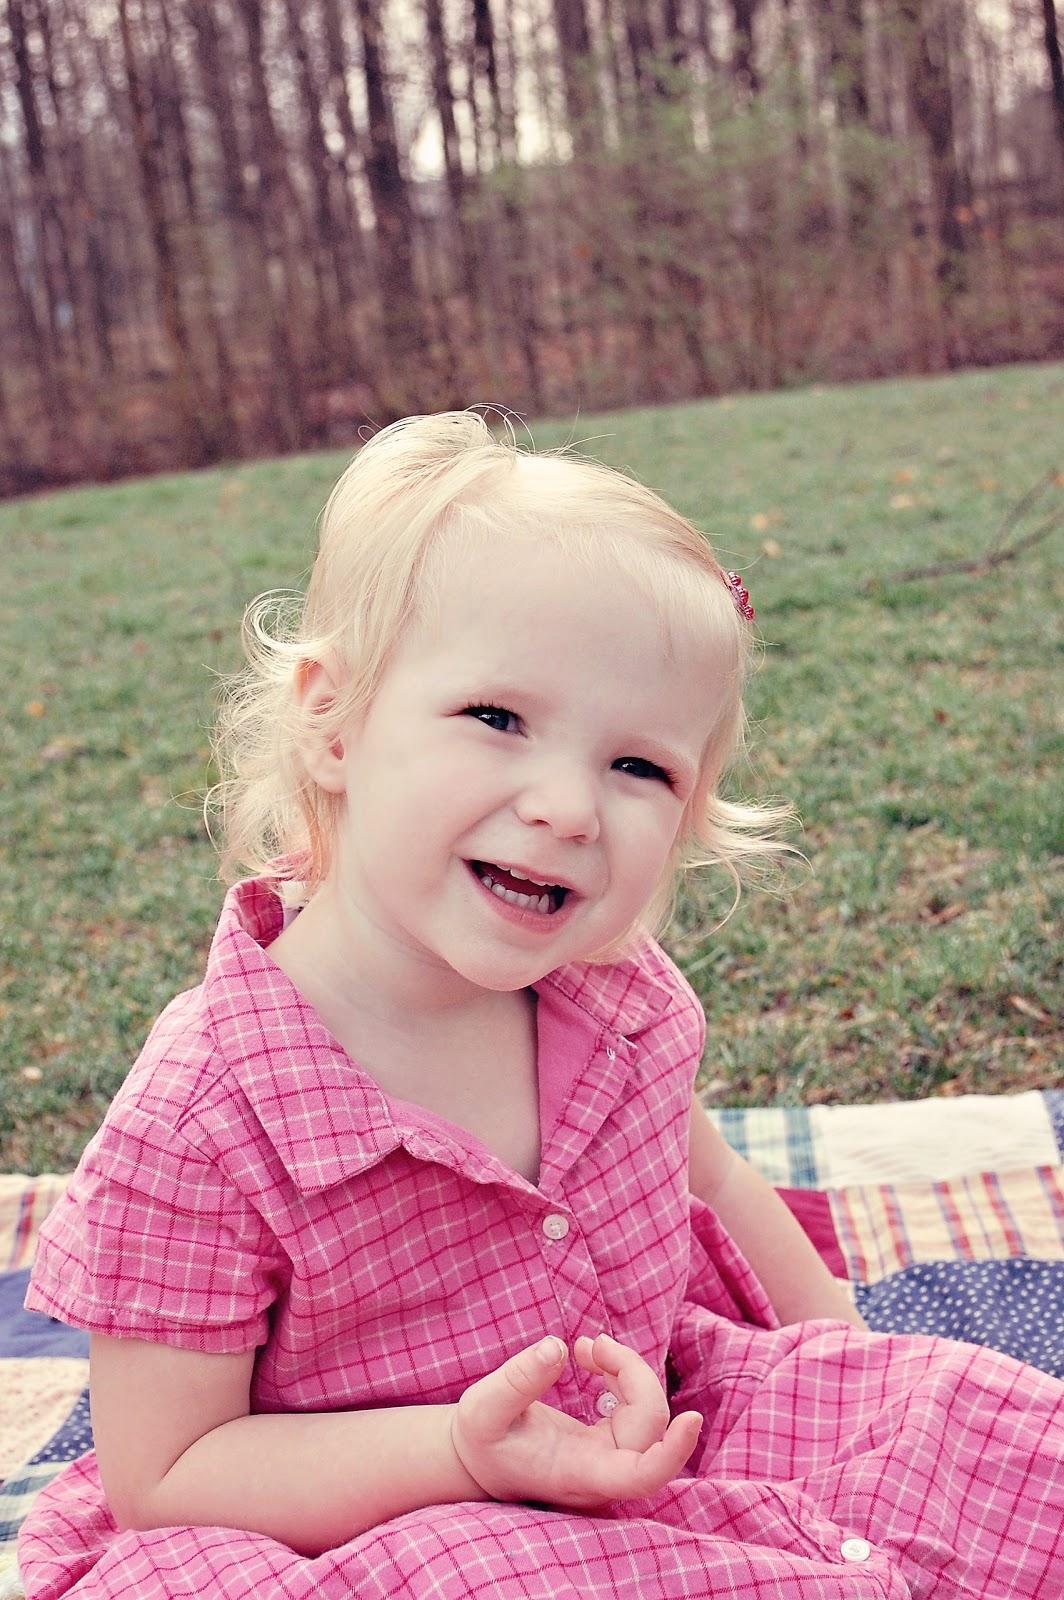 Pics of little girl haircuts